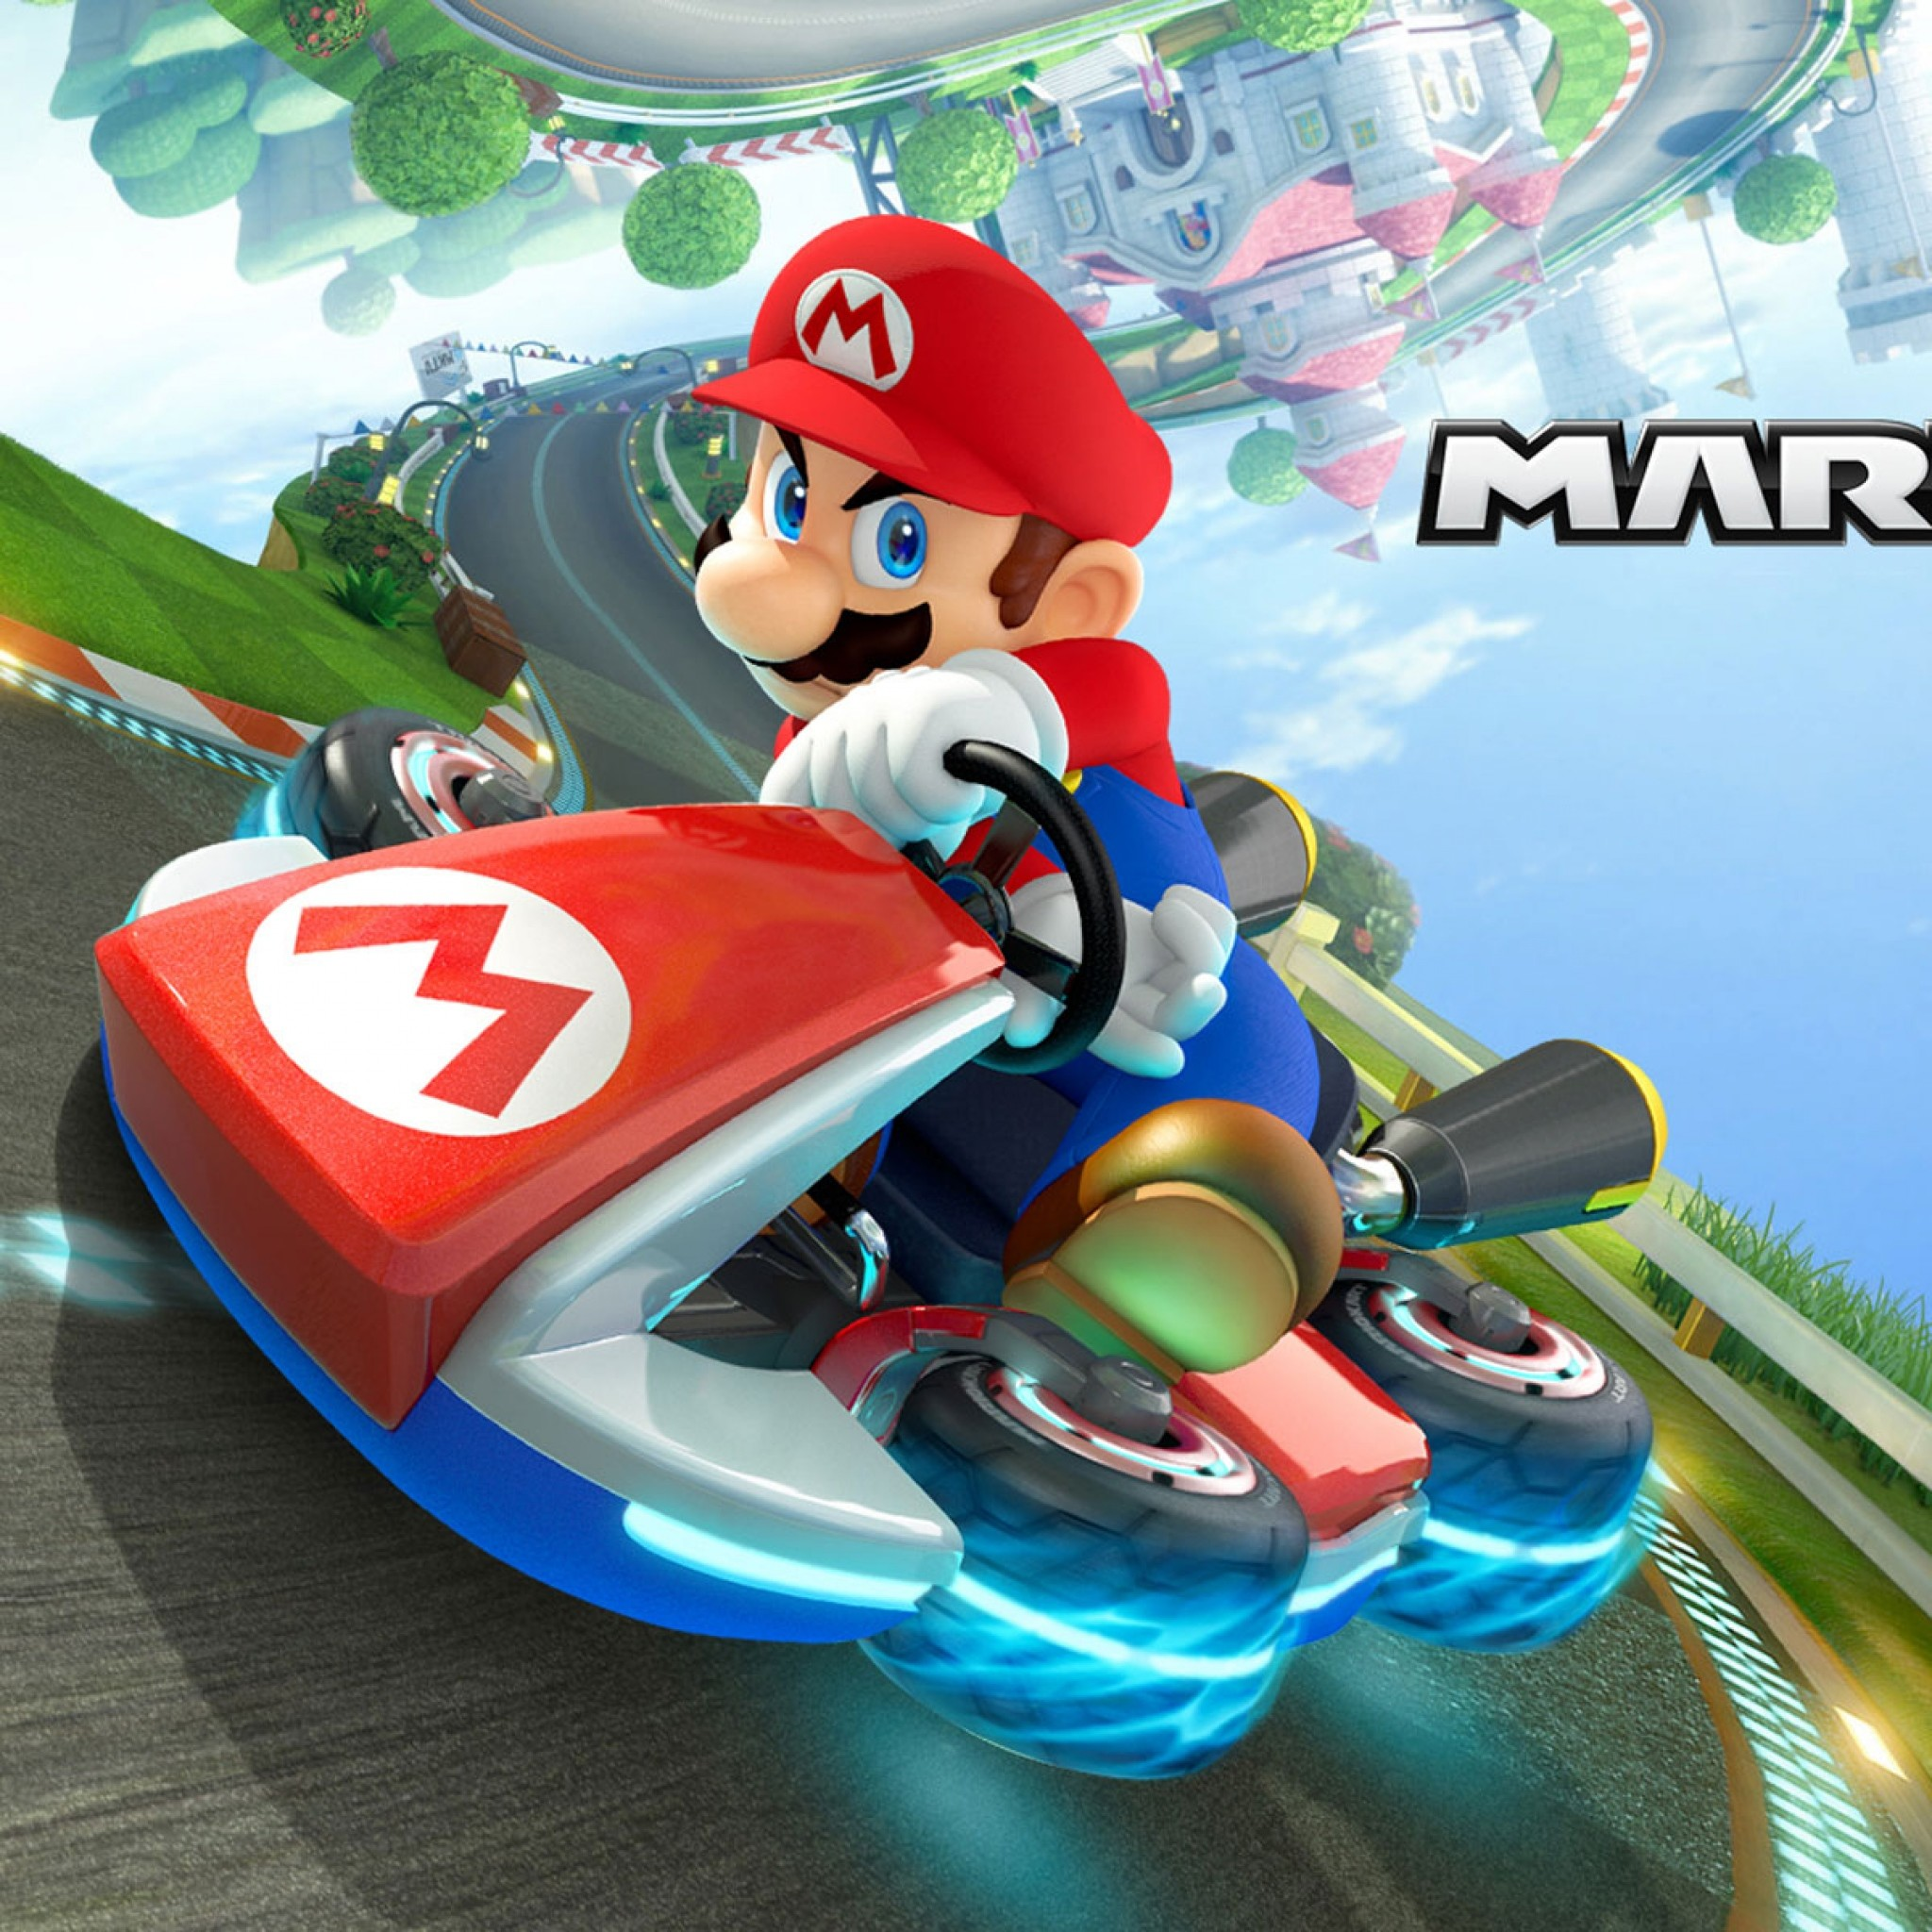 Wallpaper mario kart 8, arcade, racing, may, 2014, mario,